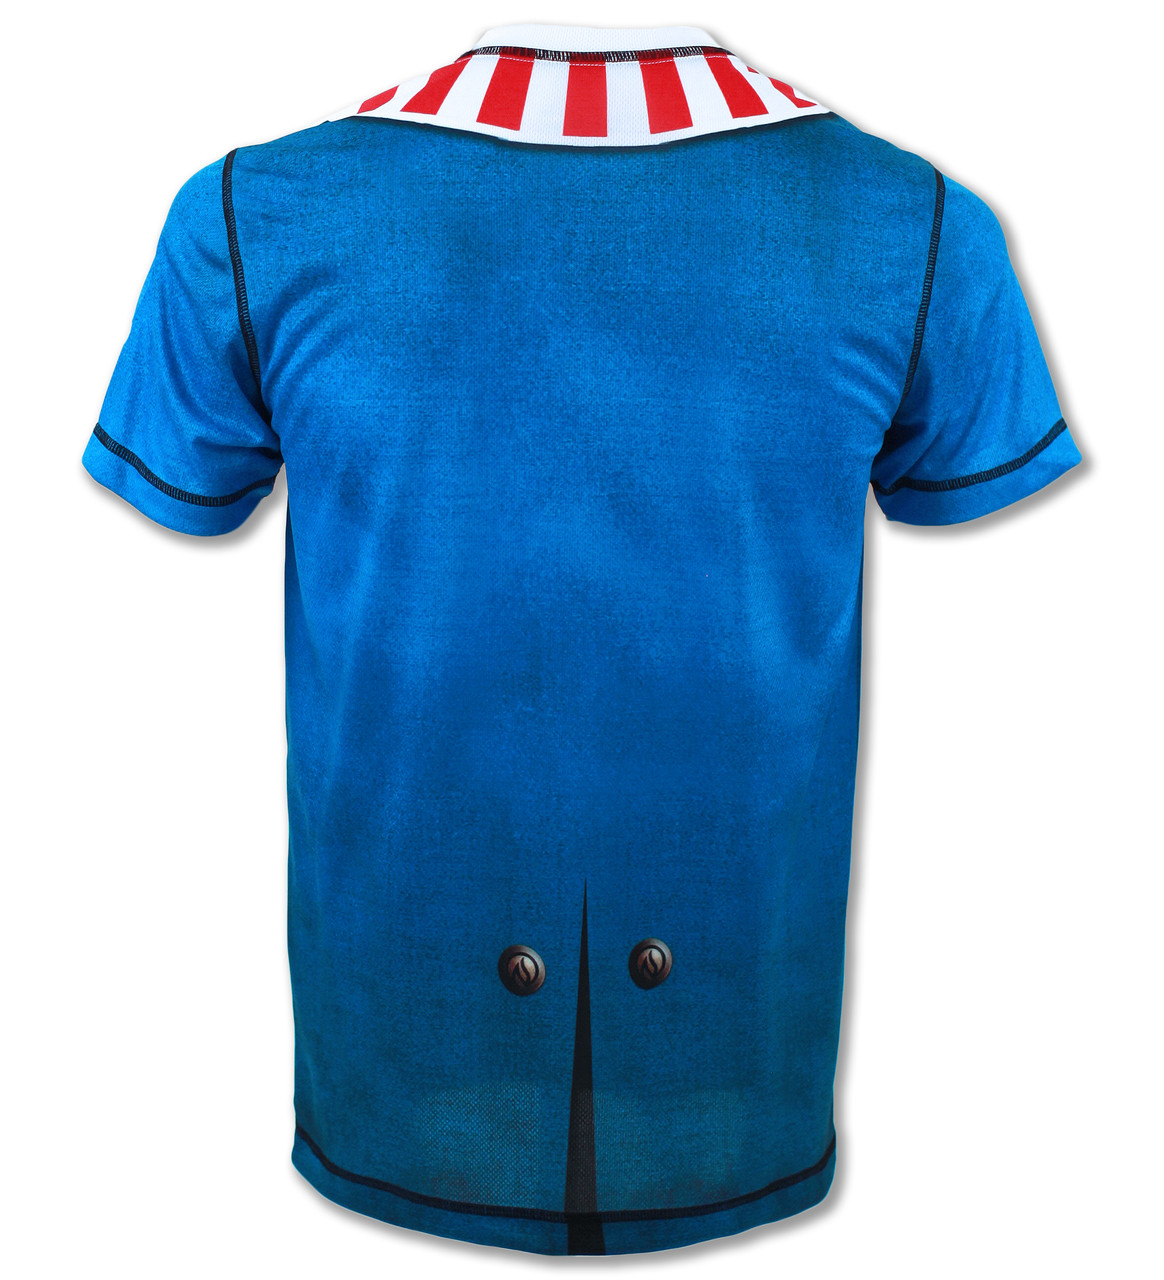 INKnBURN Mens Sam Running Shirt - Back